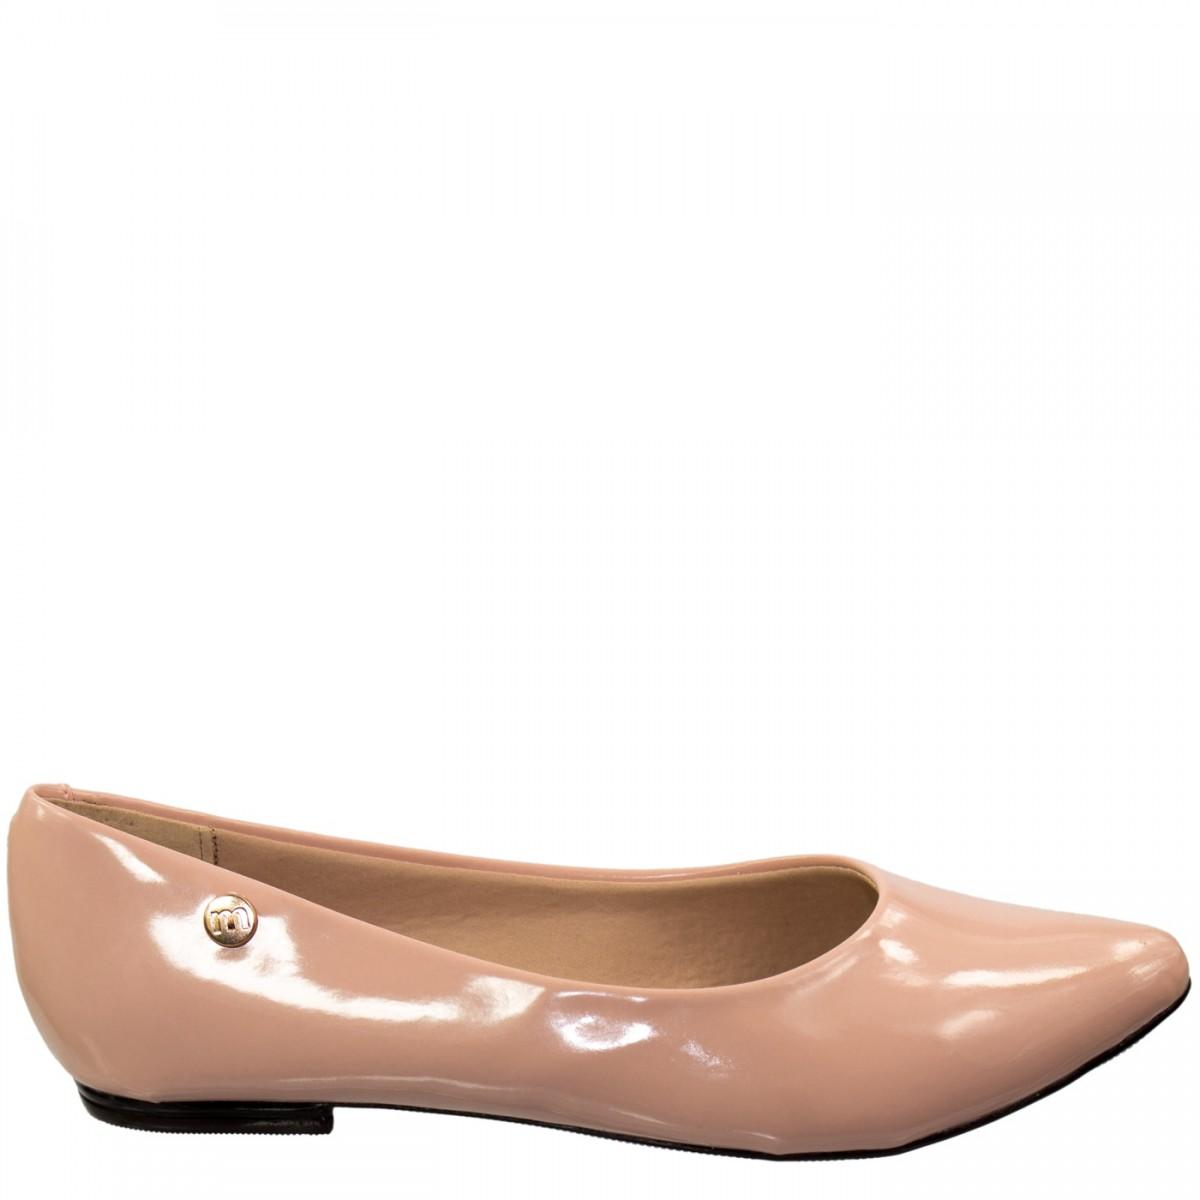 34e0a1742 Bizz Store - Sapatilha Feminina Moleca Verniz Nude Bico Fino